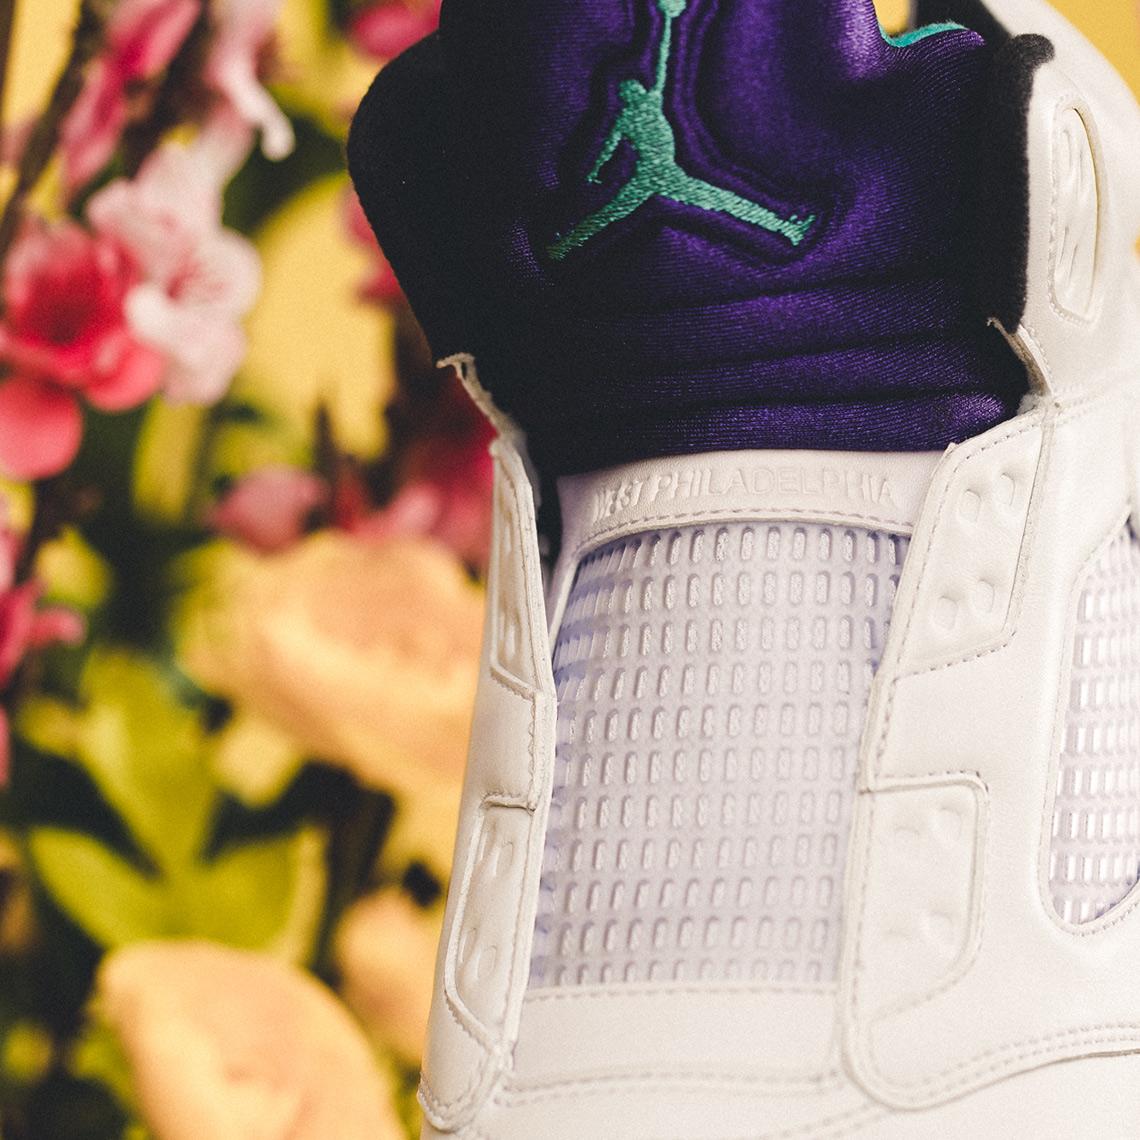 online store dfacc 4f84c Air Jordan 5 Fresh Prince Release Info + Photos ...